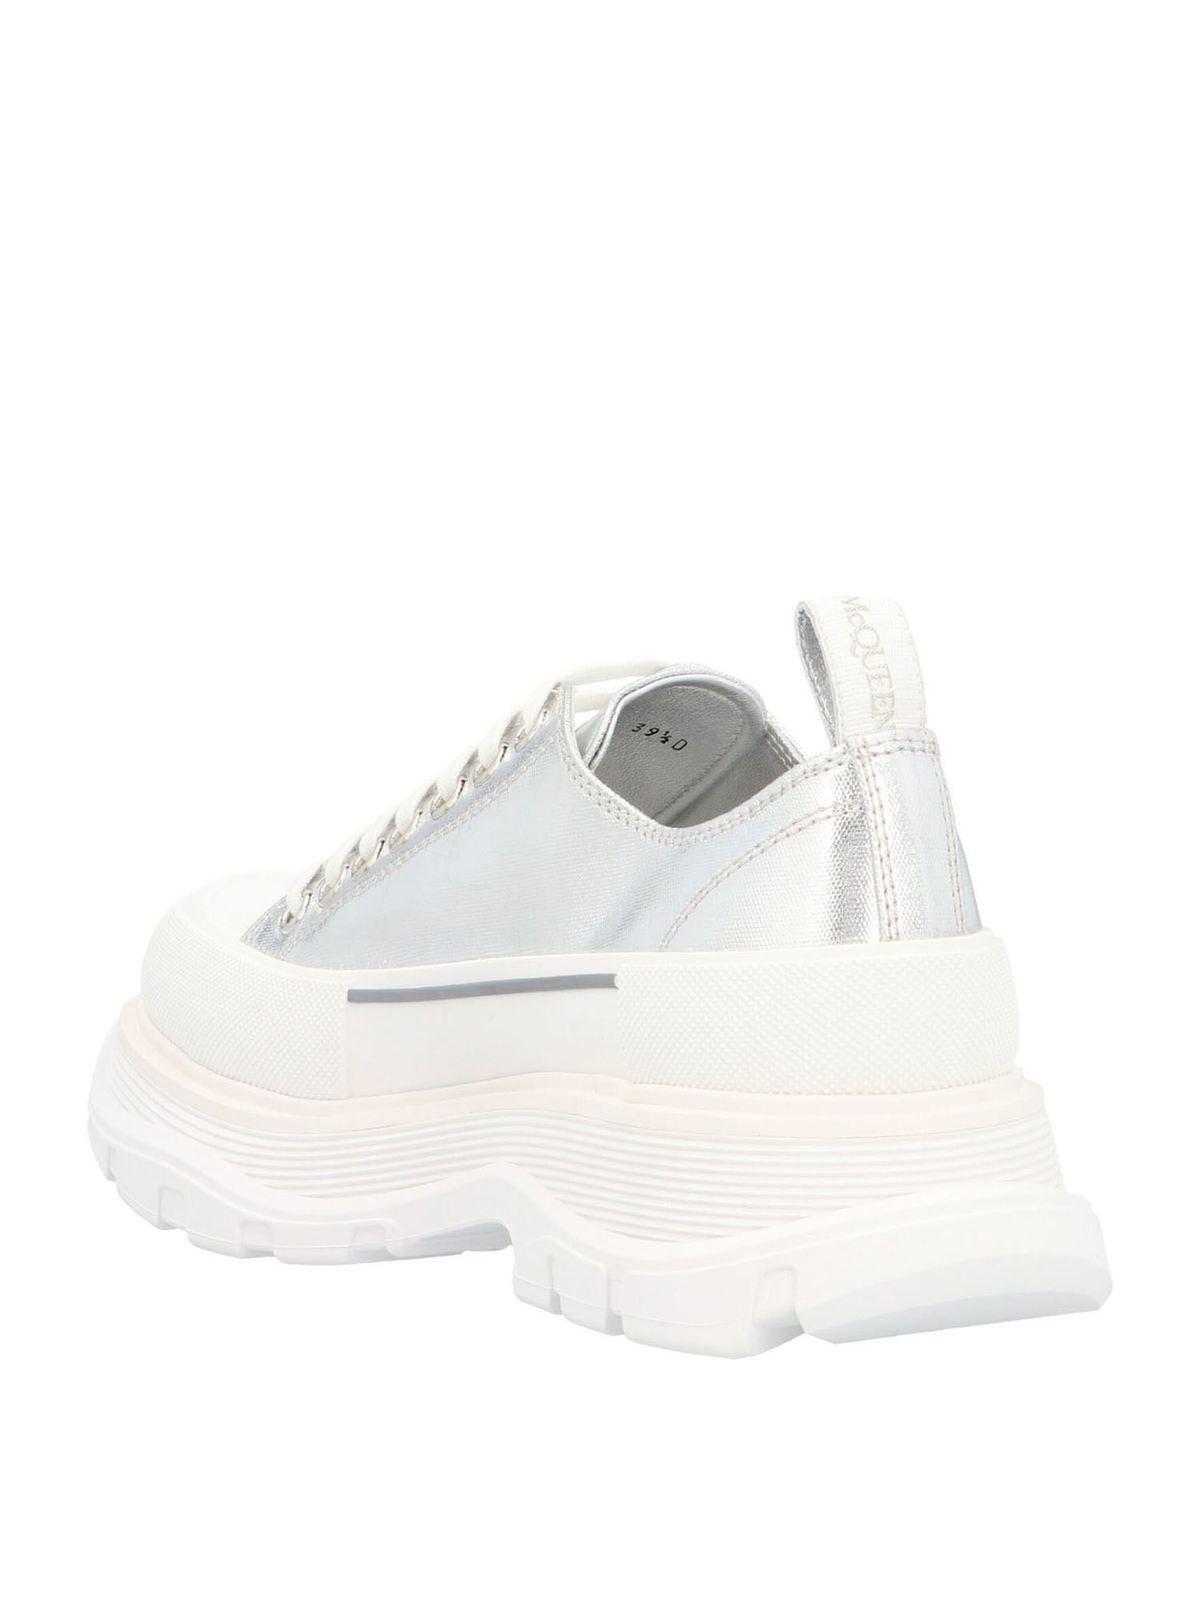 Tread slick sneakers in silver color